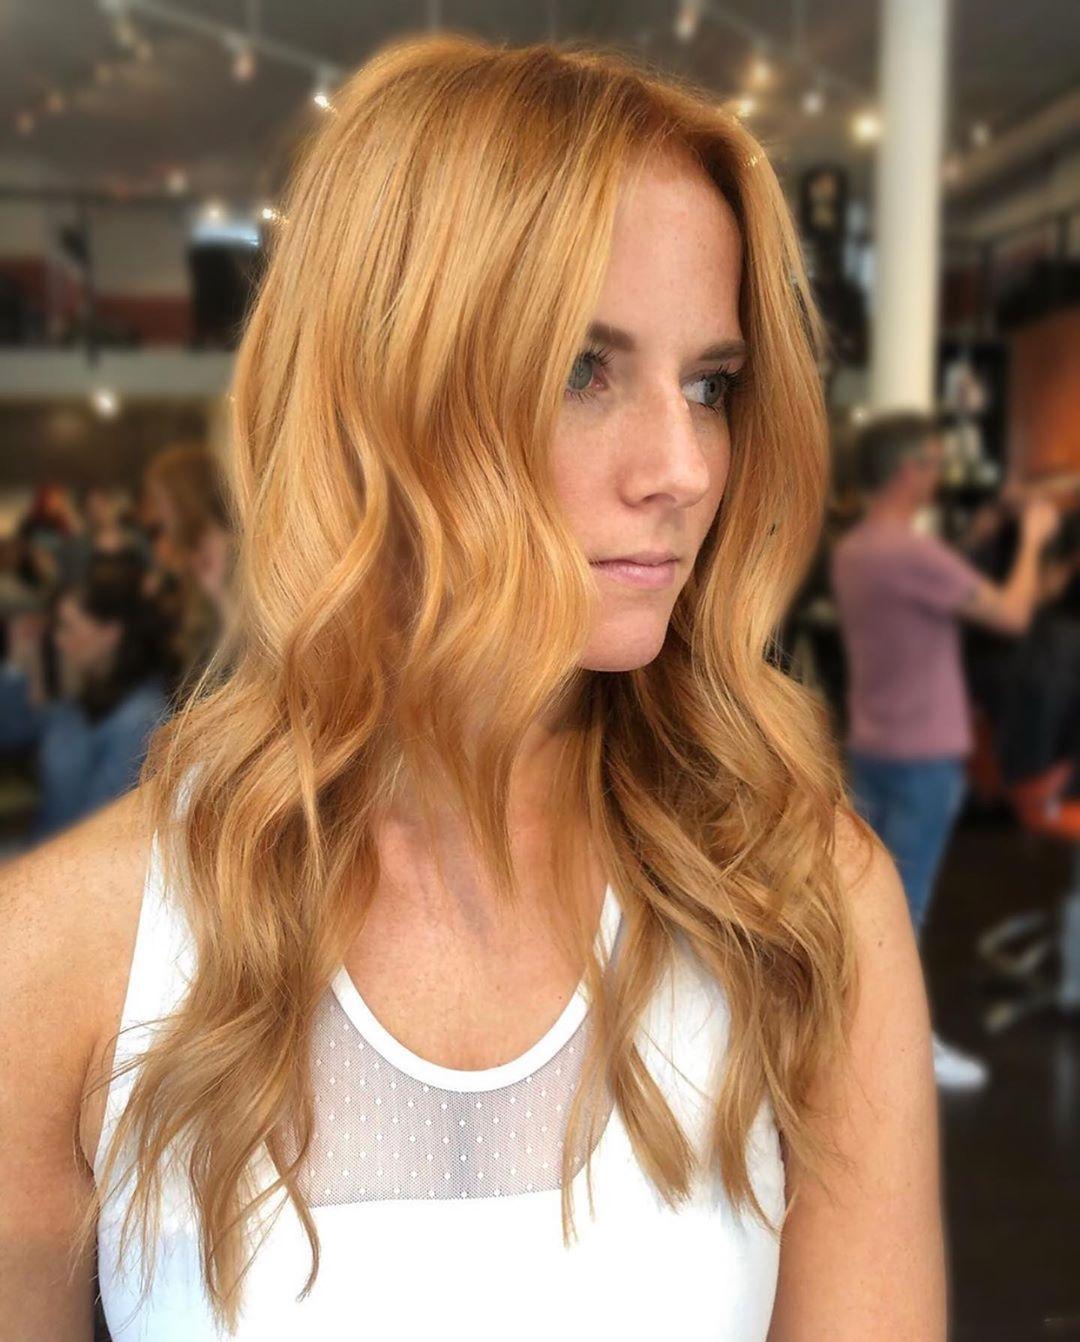 Golden Strawberry blonde highlights